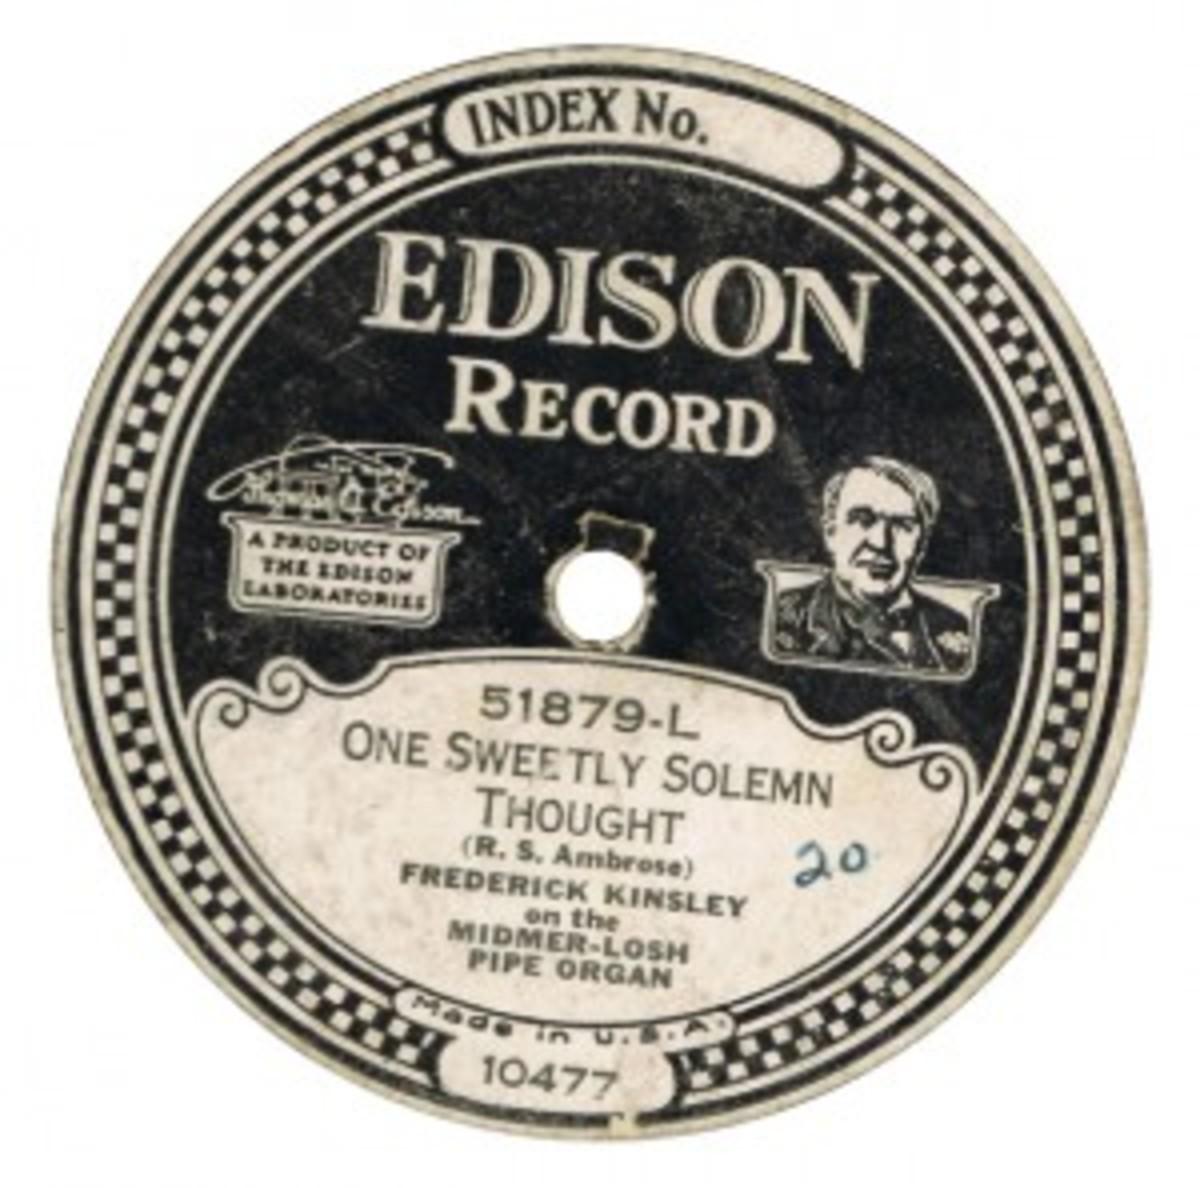 Edison record, frederick kinsley,